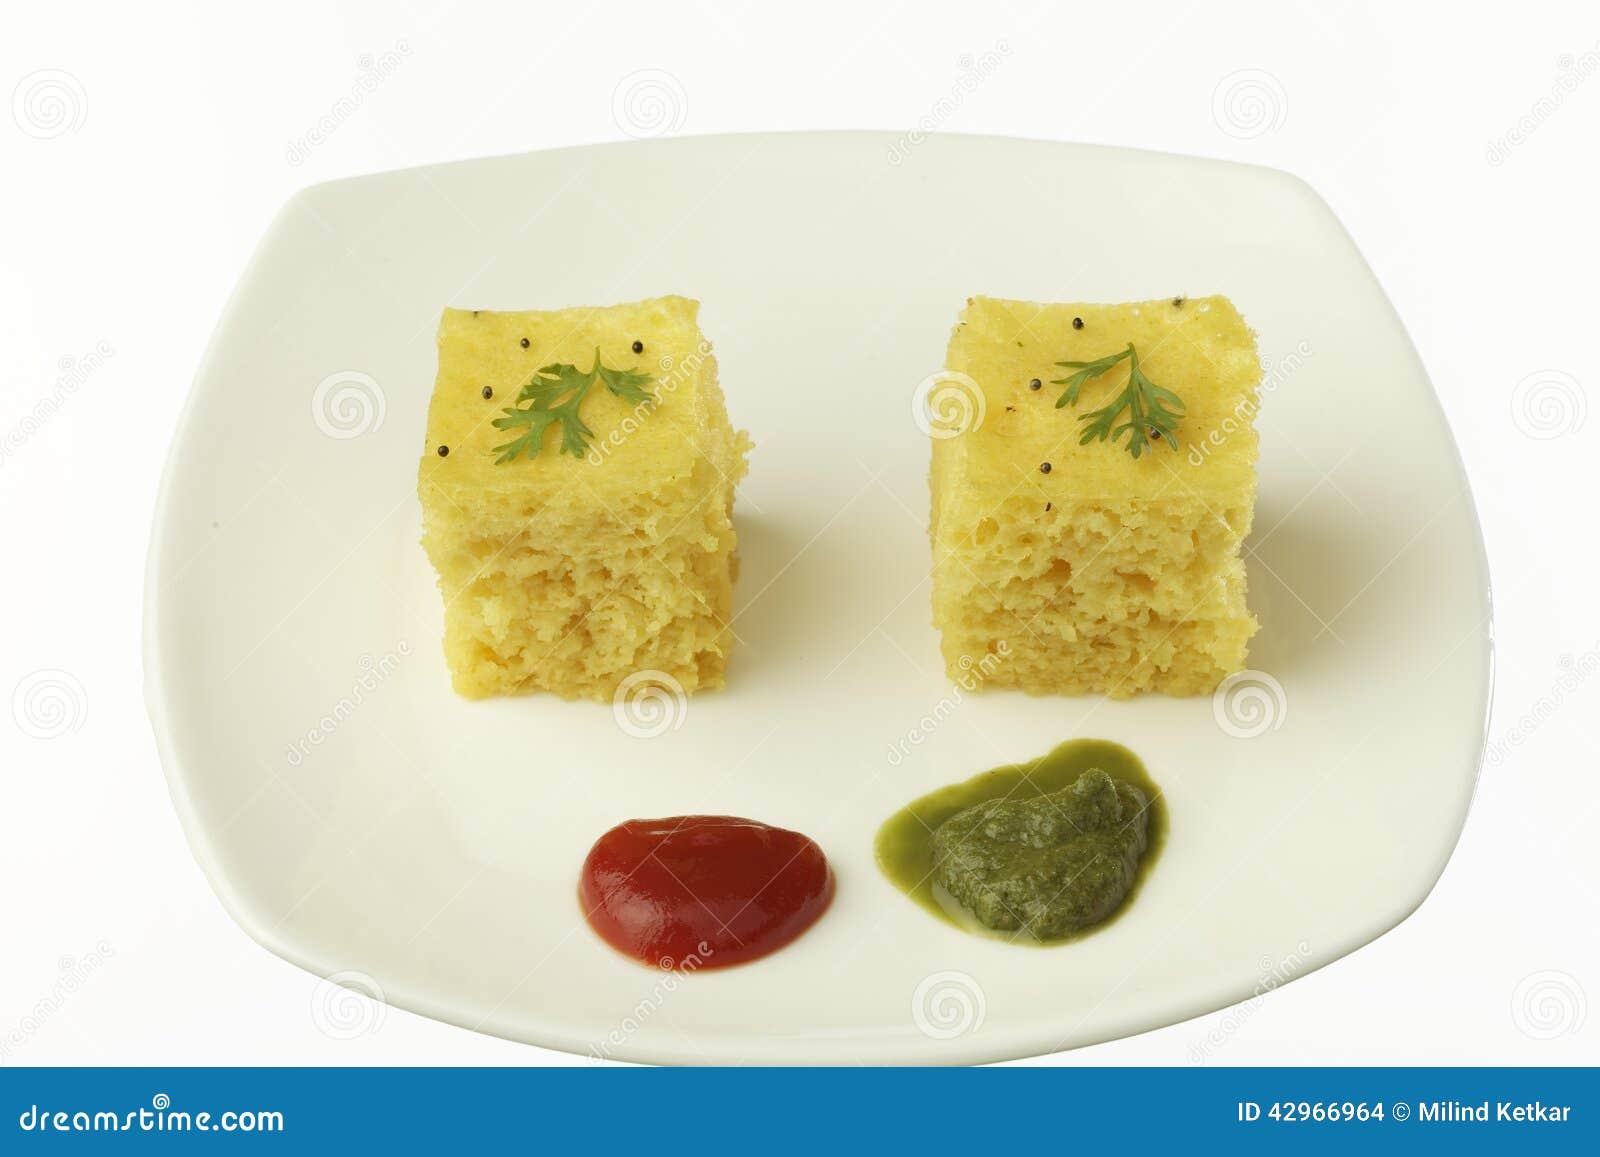 ... gujarati-lentil-cake-dhokla-plate-tomato-ketchup-chutney-42966964.jpg